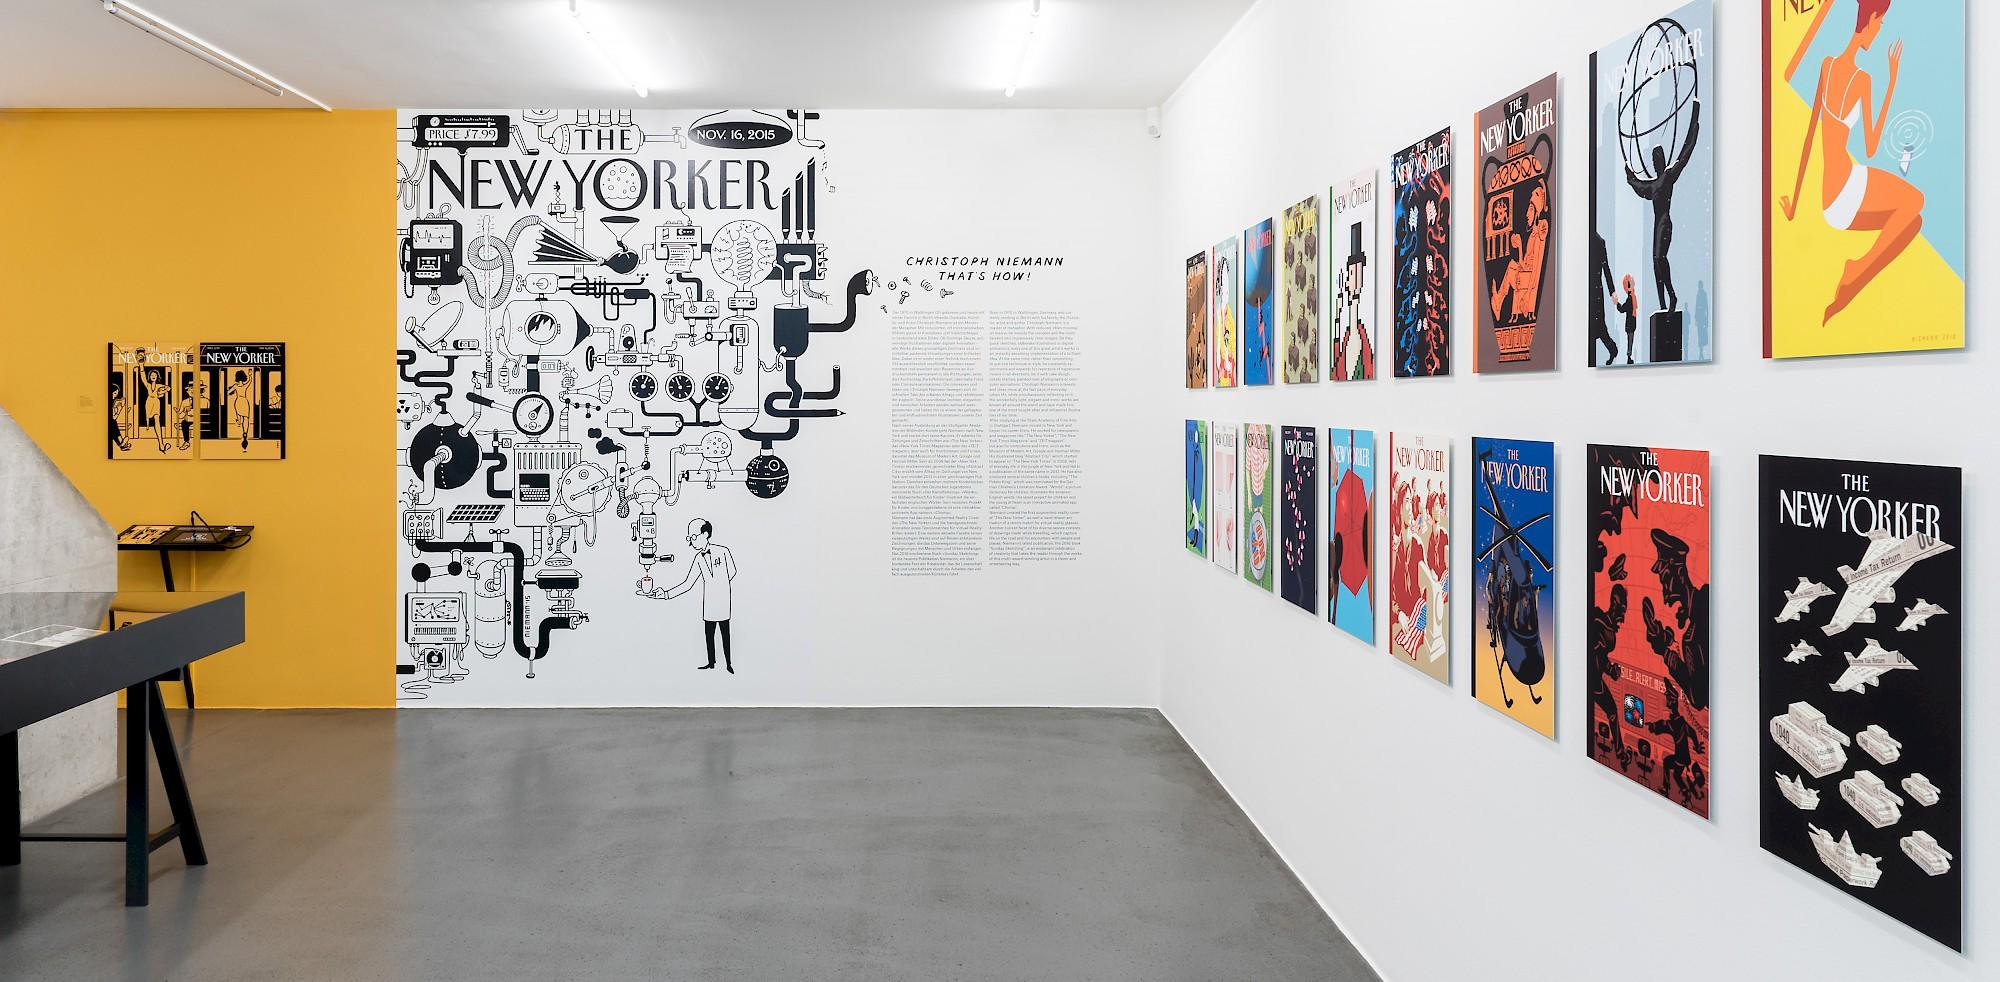 hauser schwarz visuelle kommunikation und grafik in basel. Black Bedroom Furniture Sets. Home Design Ideas